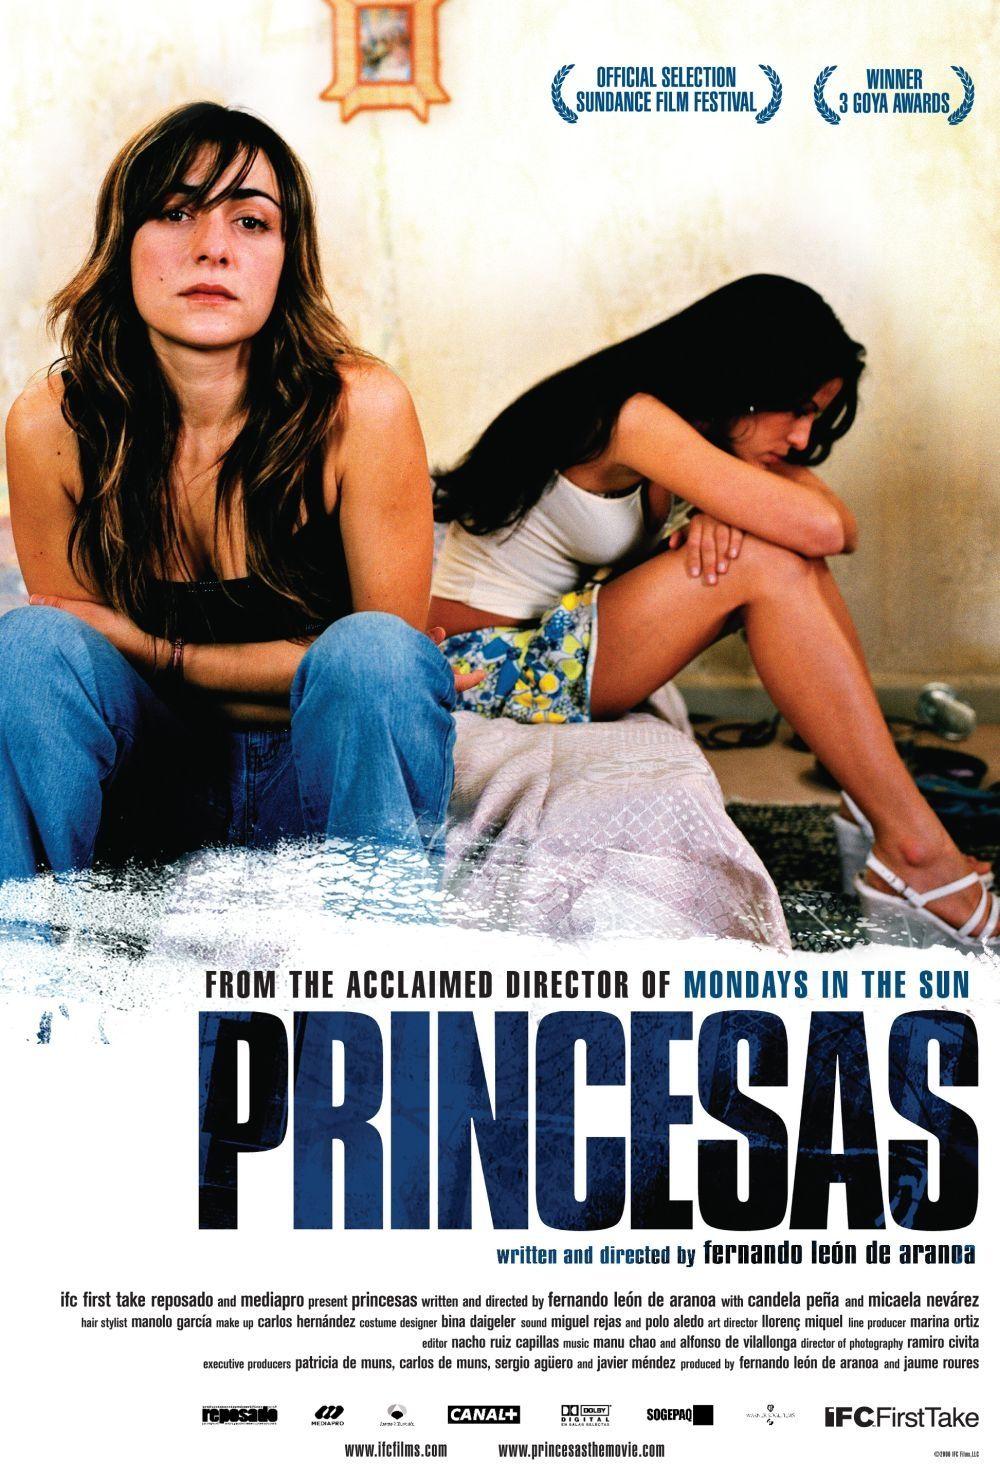 2005_Princesas_(Fernando_Leon_de_Aranoa)_USA_1